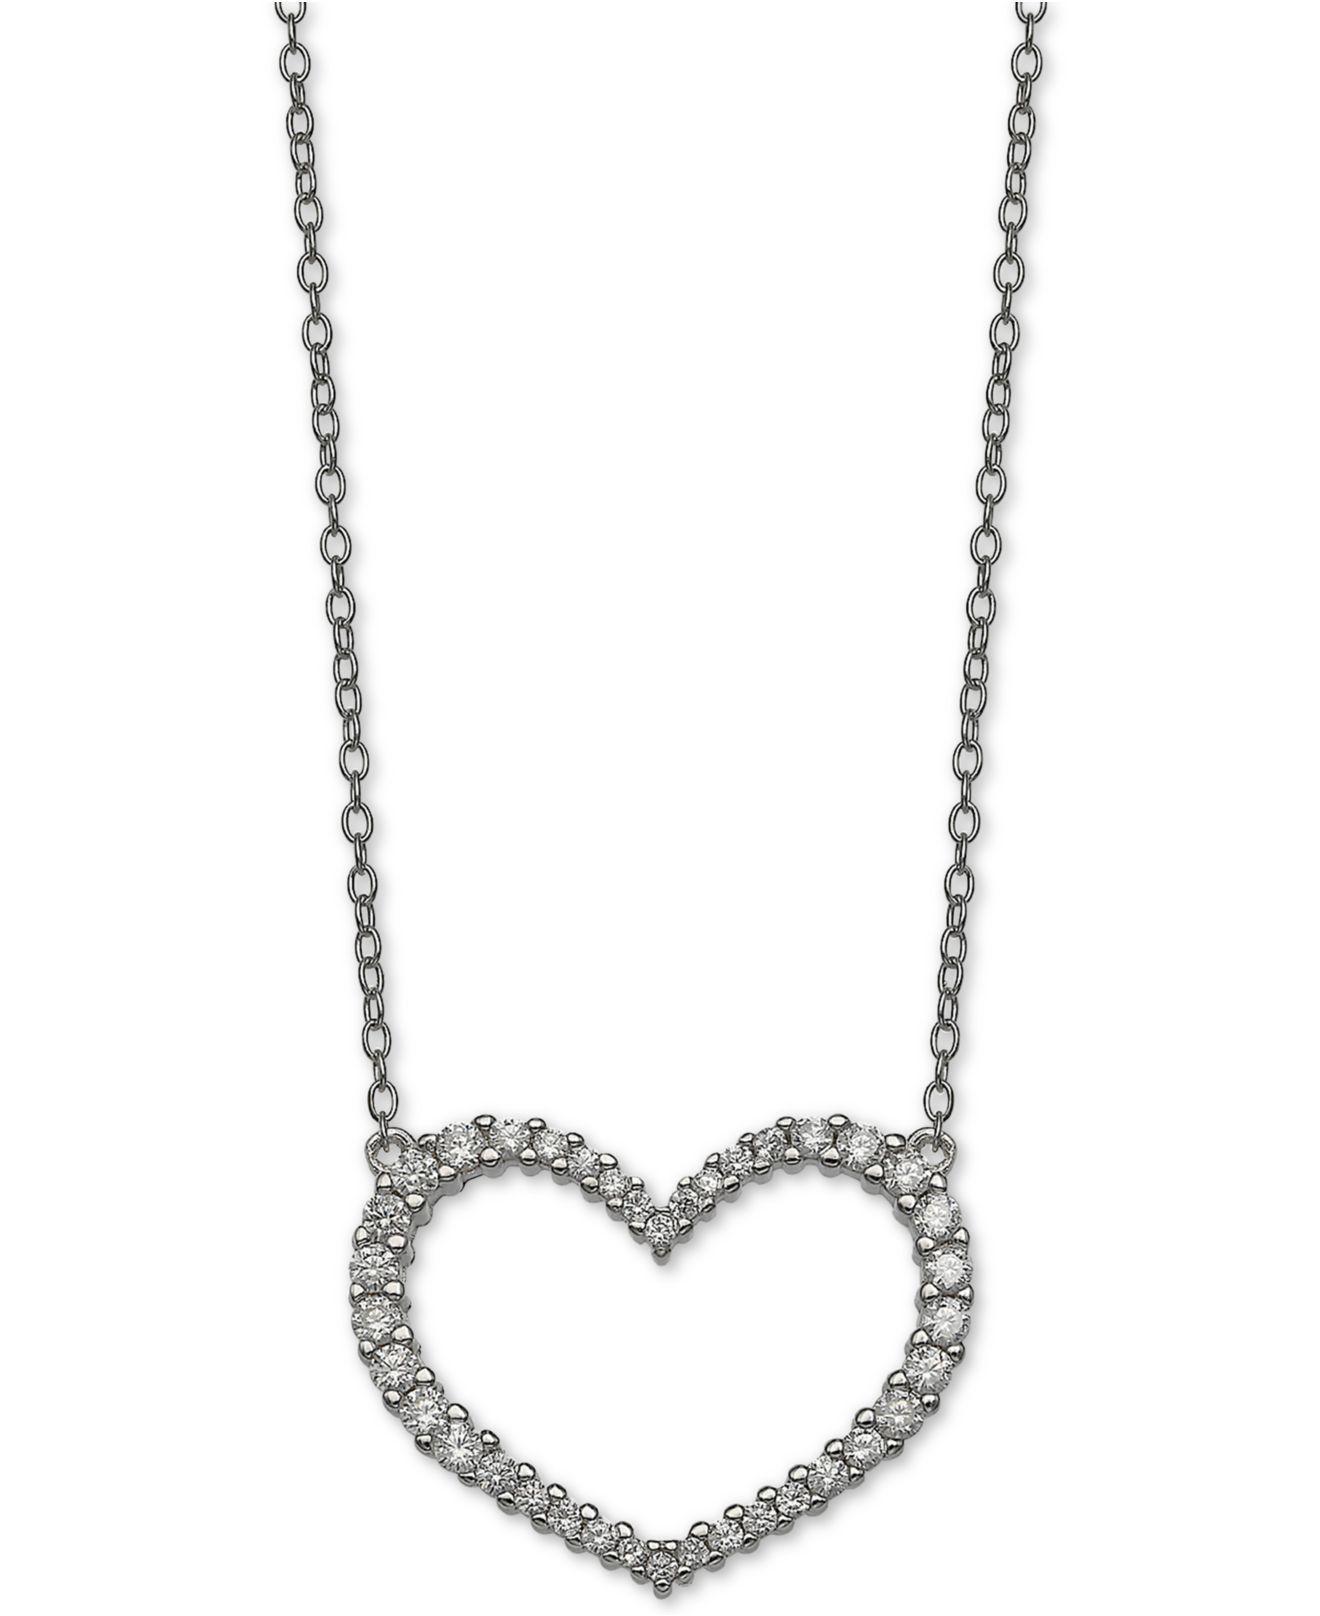 Giani Bernini Cubic Zirconia Heart 18 Pendant Necklace In